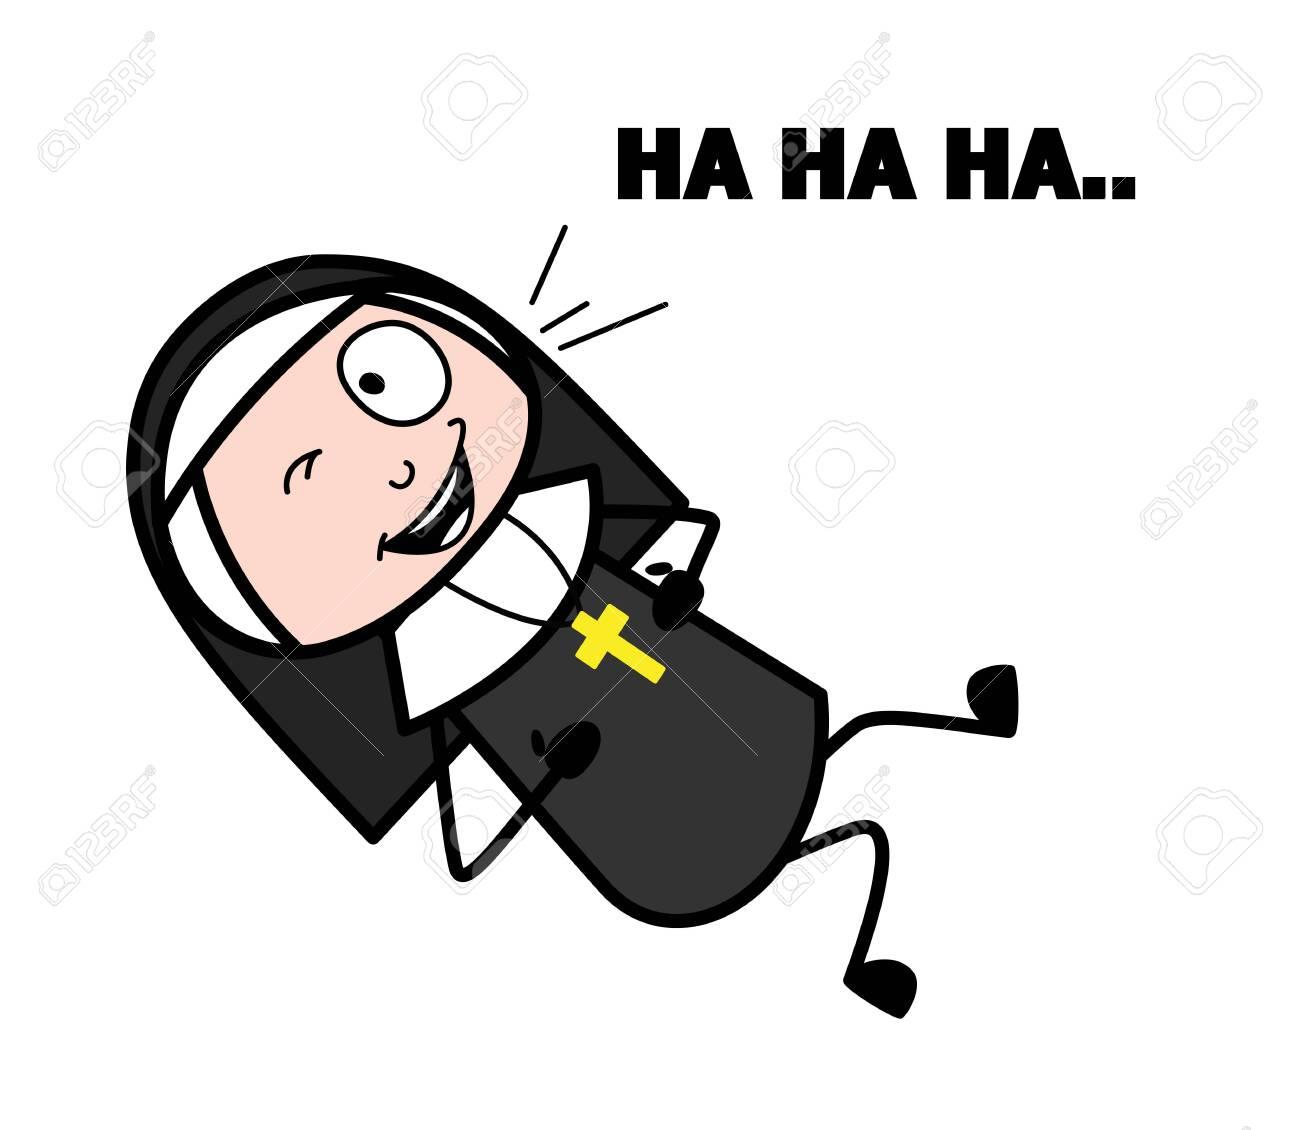 Penguin Cartoon png download - 495*1050 - Free Transparent Nun png  Download. - CleanPNG / KissPNG